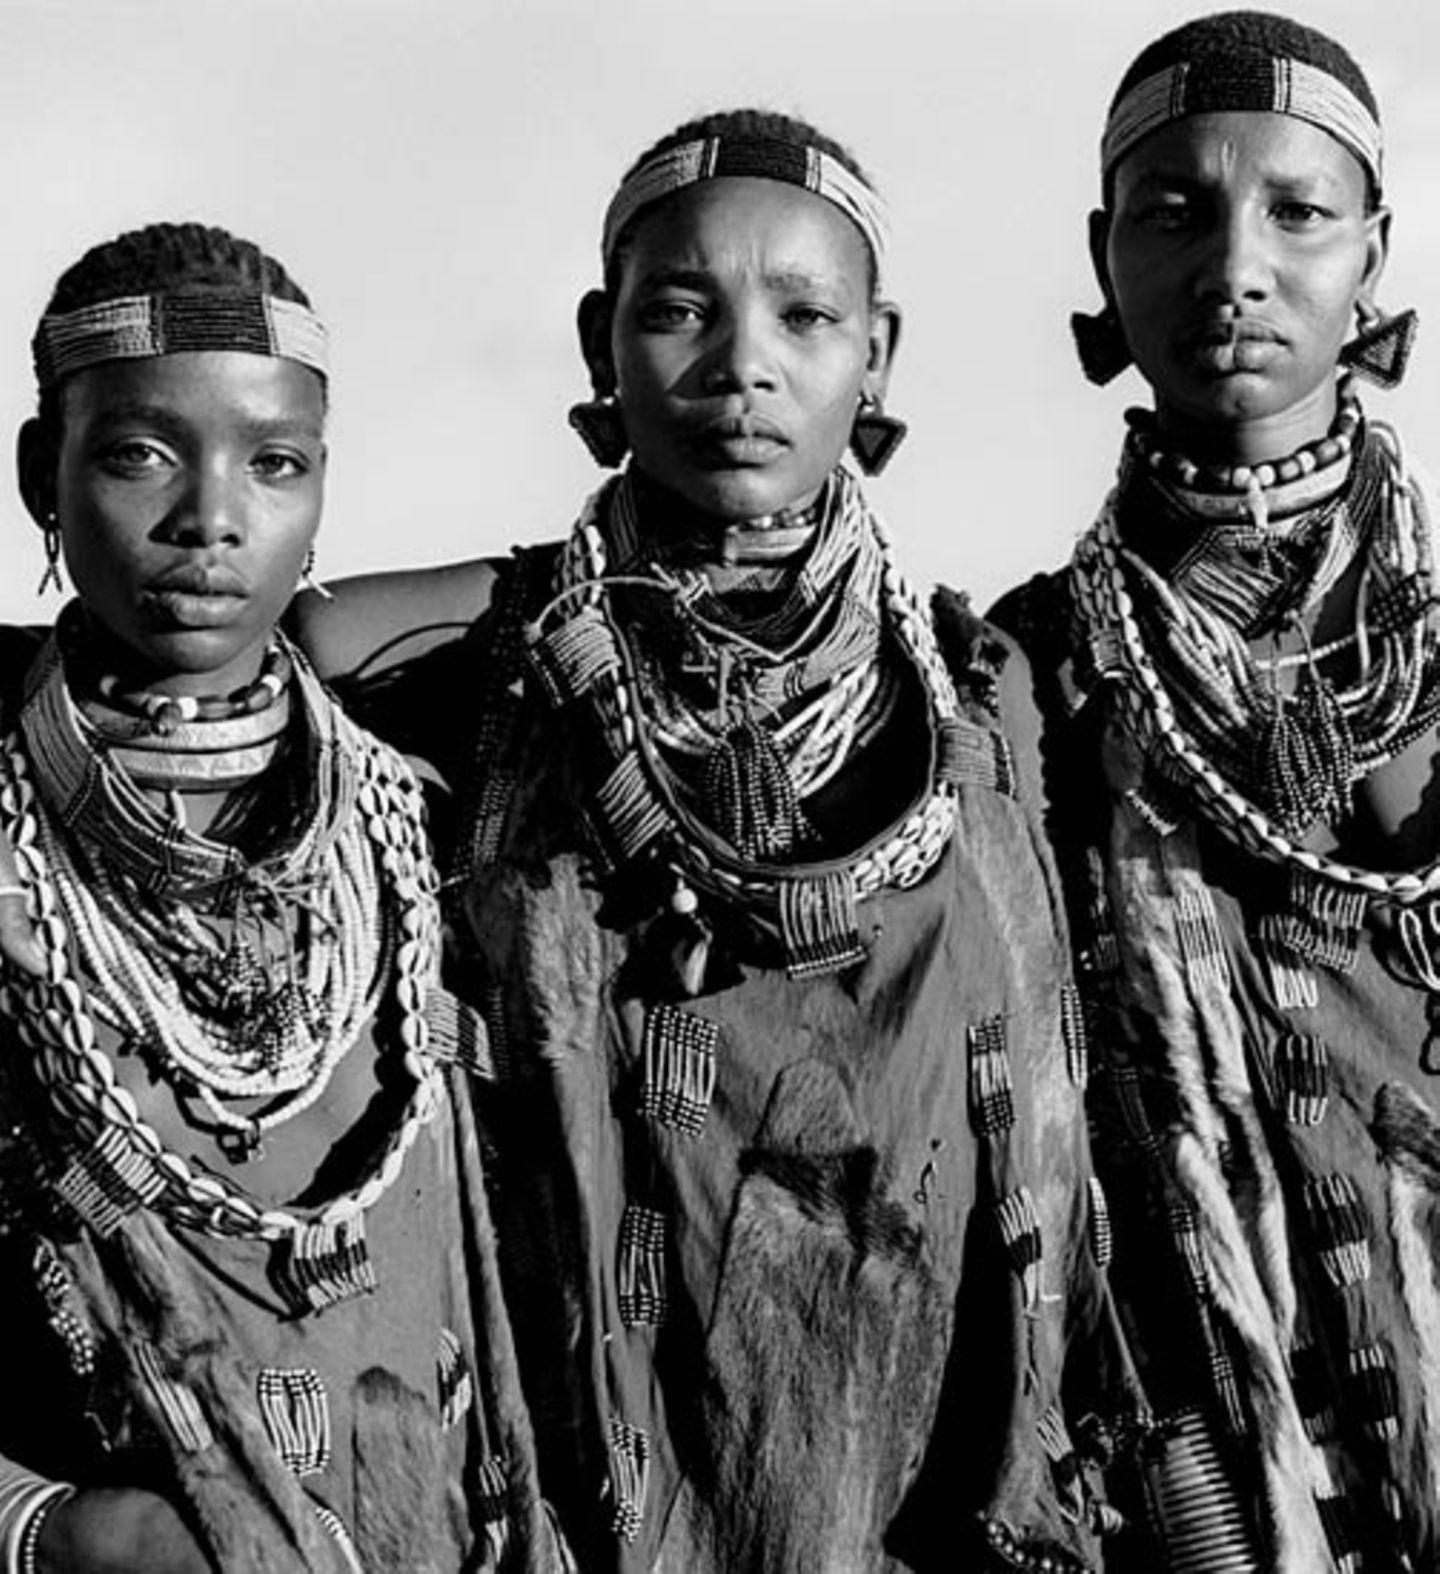 Fotogalerie: Bildband Ethiopia - Bild 2